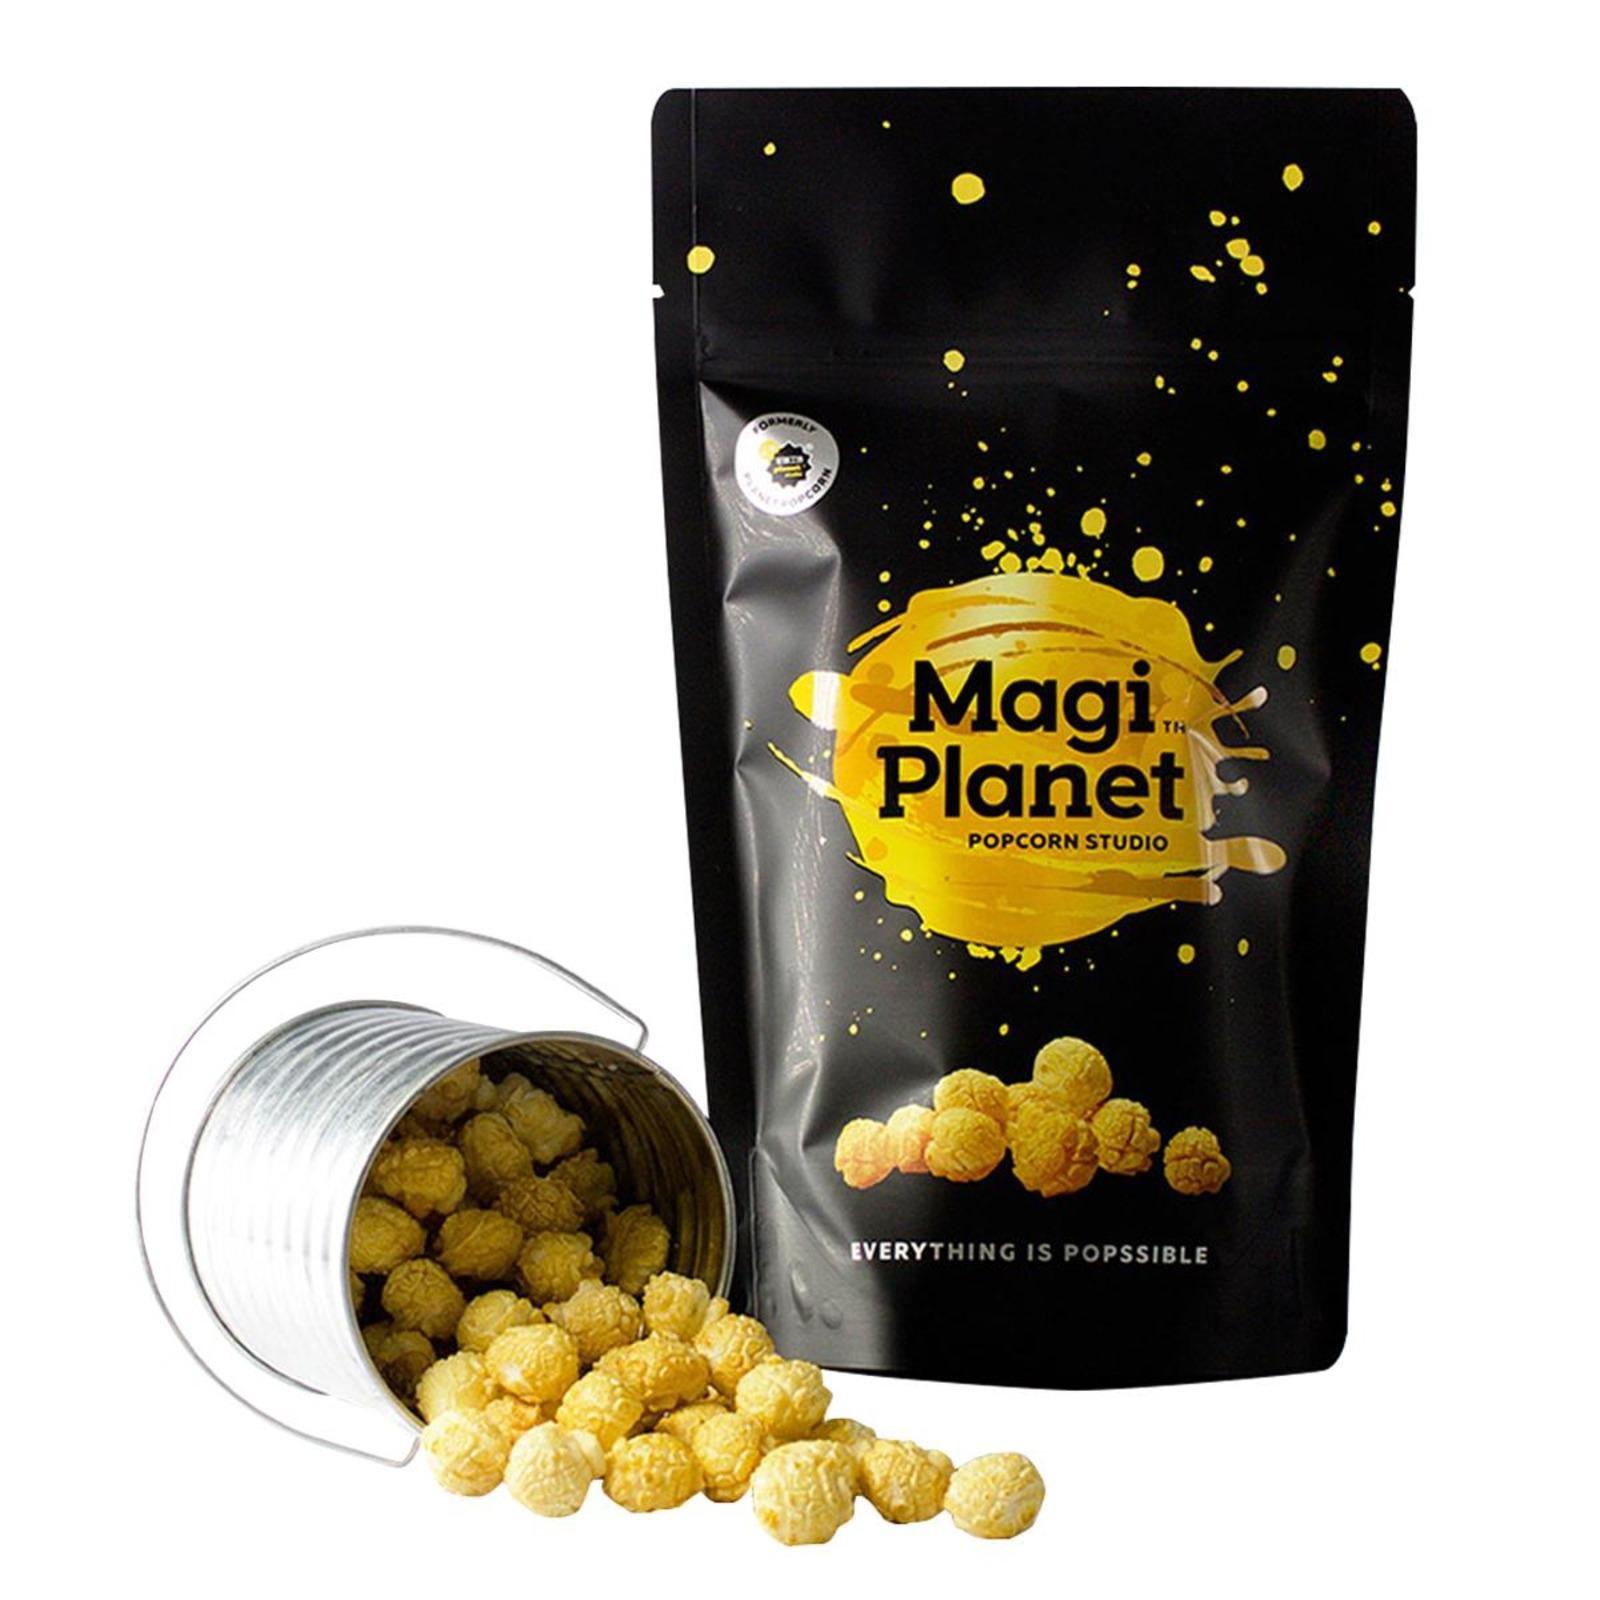 Magi Planet Caramel